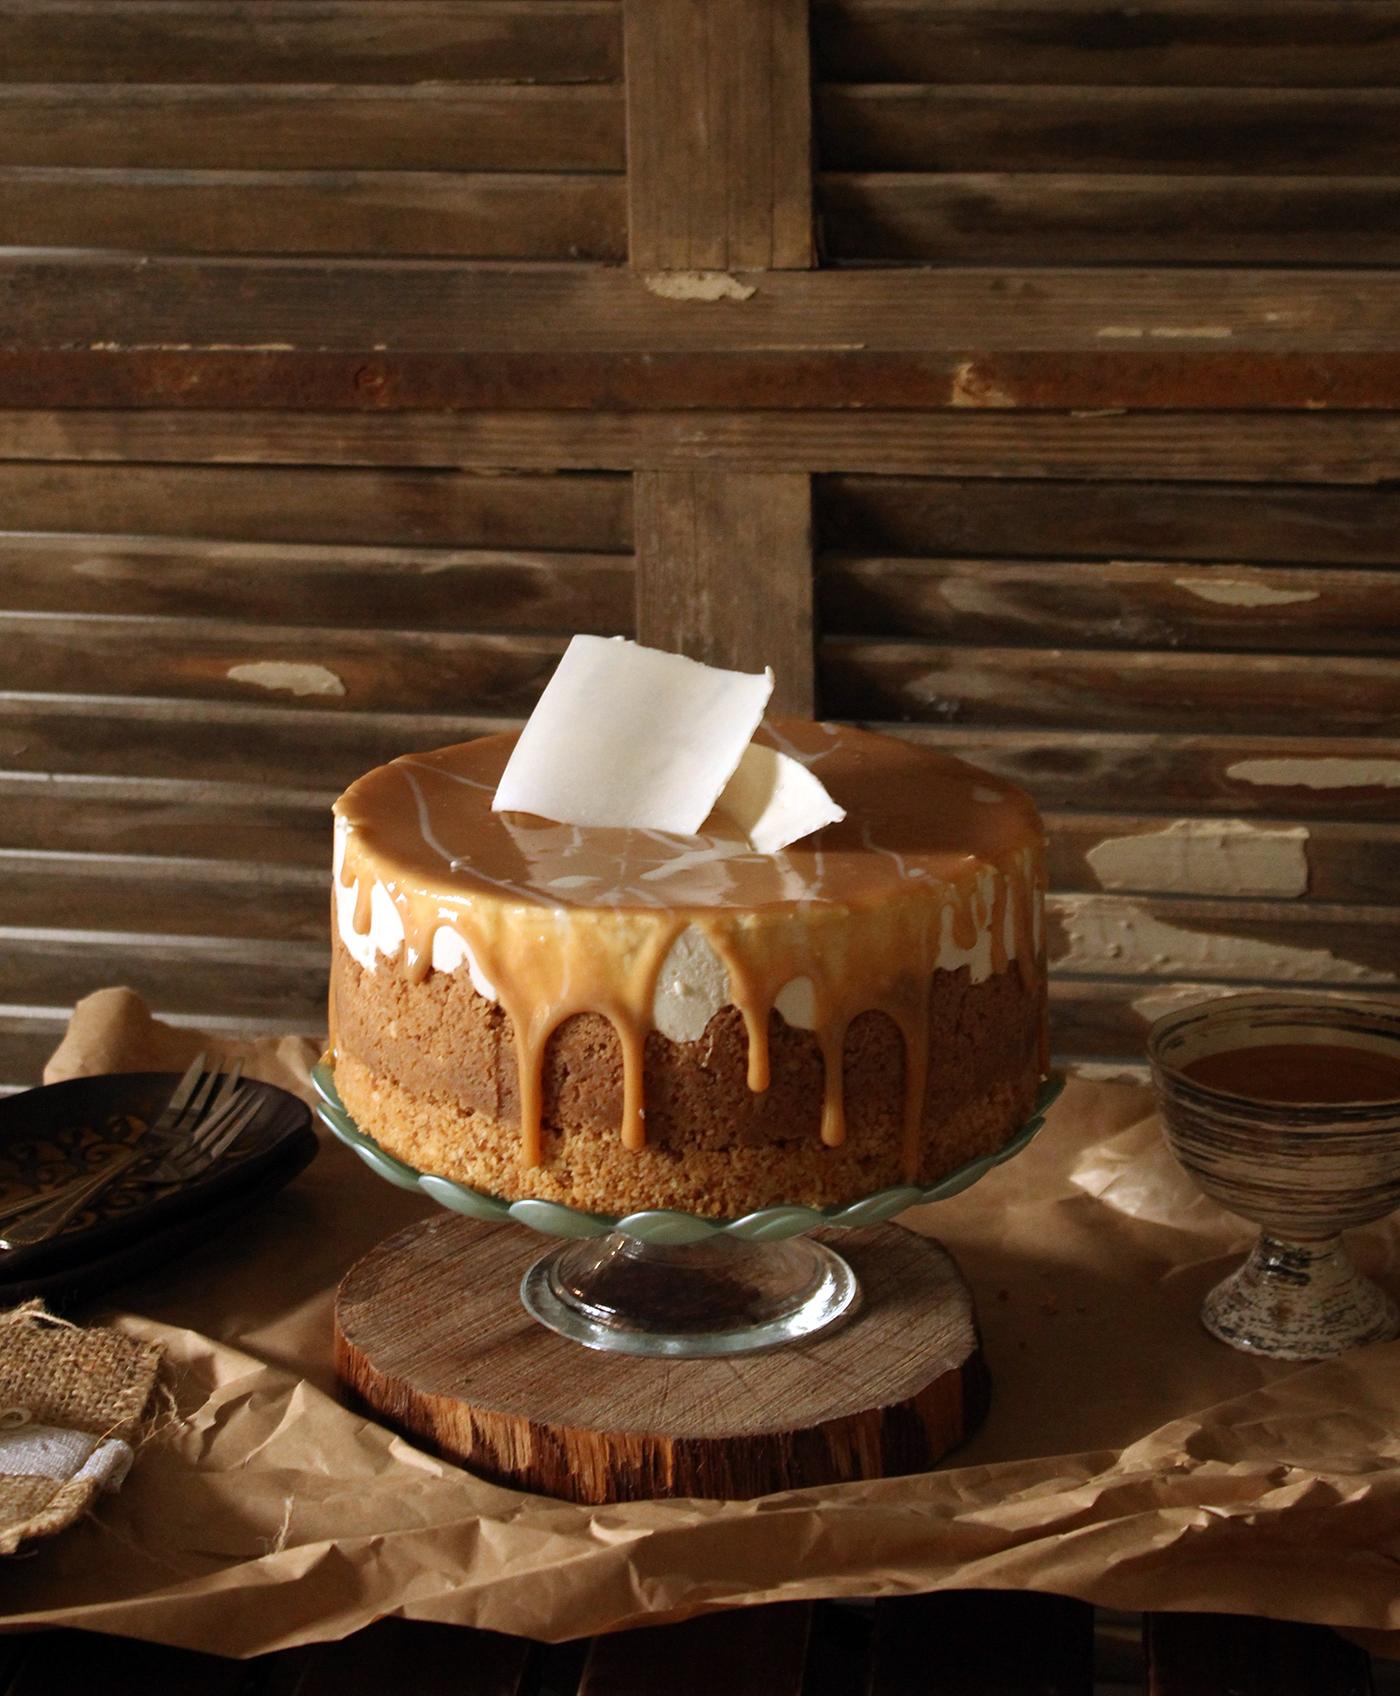 IMG 8331 - עוגת גבינה בציפוי ריבת חלב